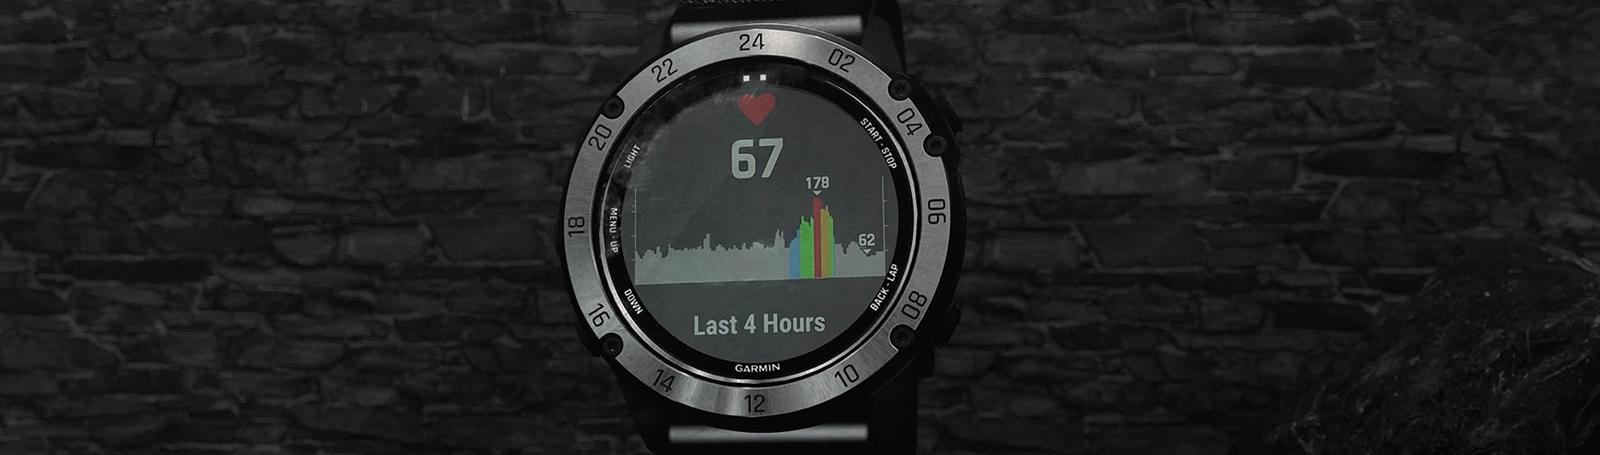 Garmin GPS Multisportuhr Tactix Delta Solar Ballistic Edition